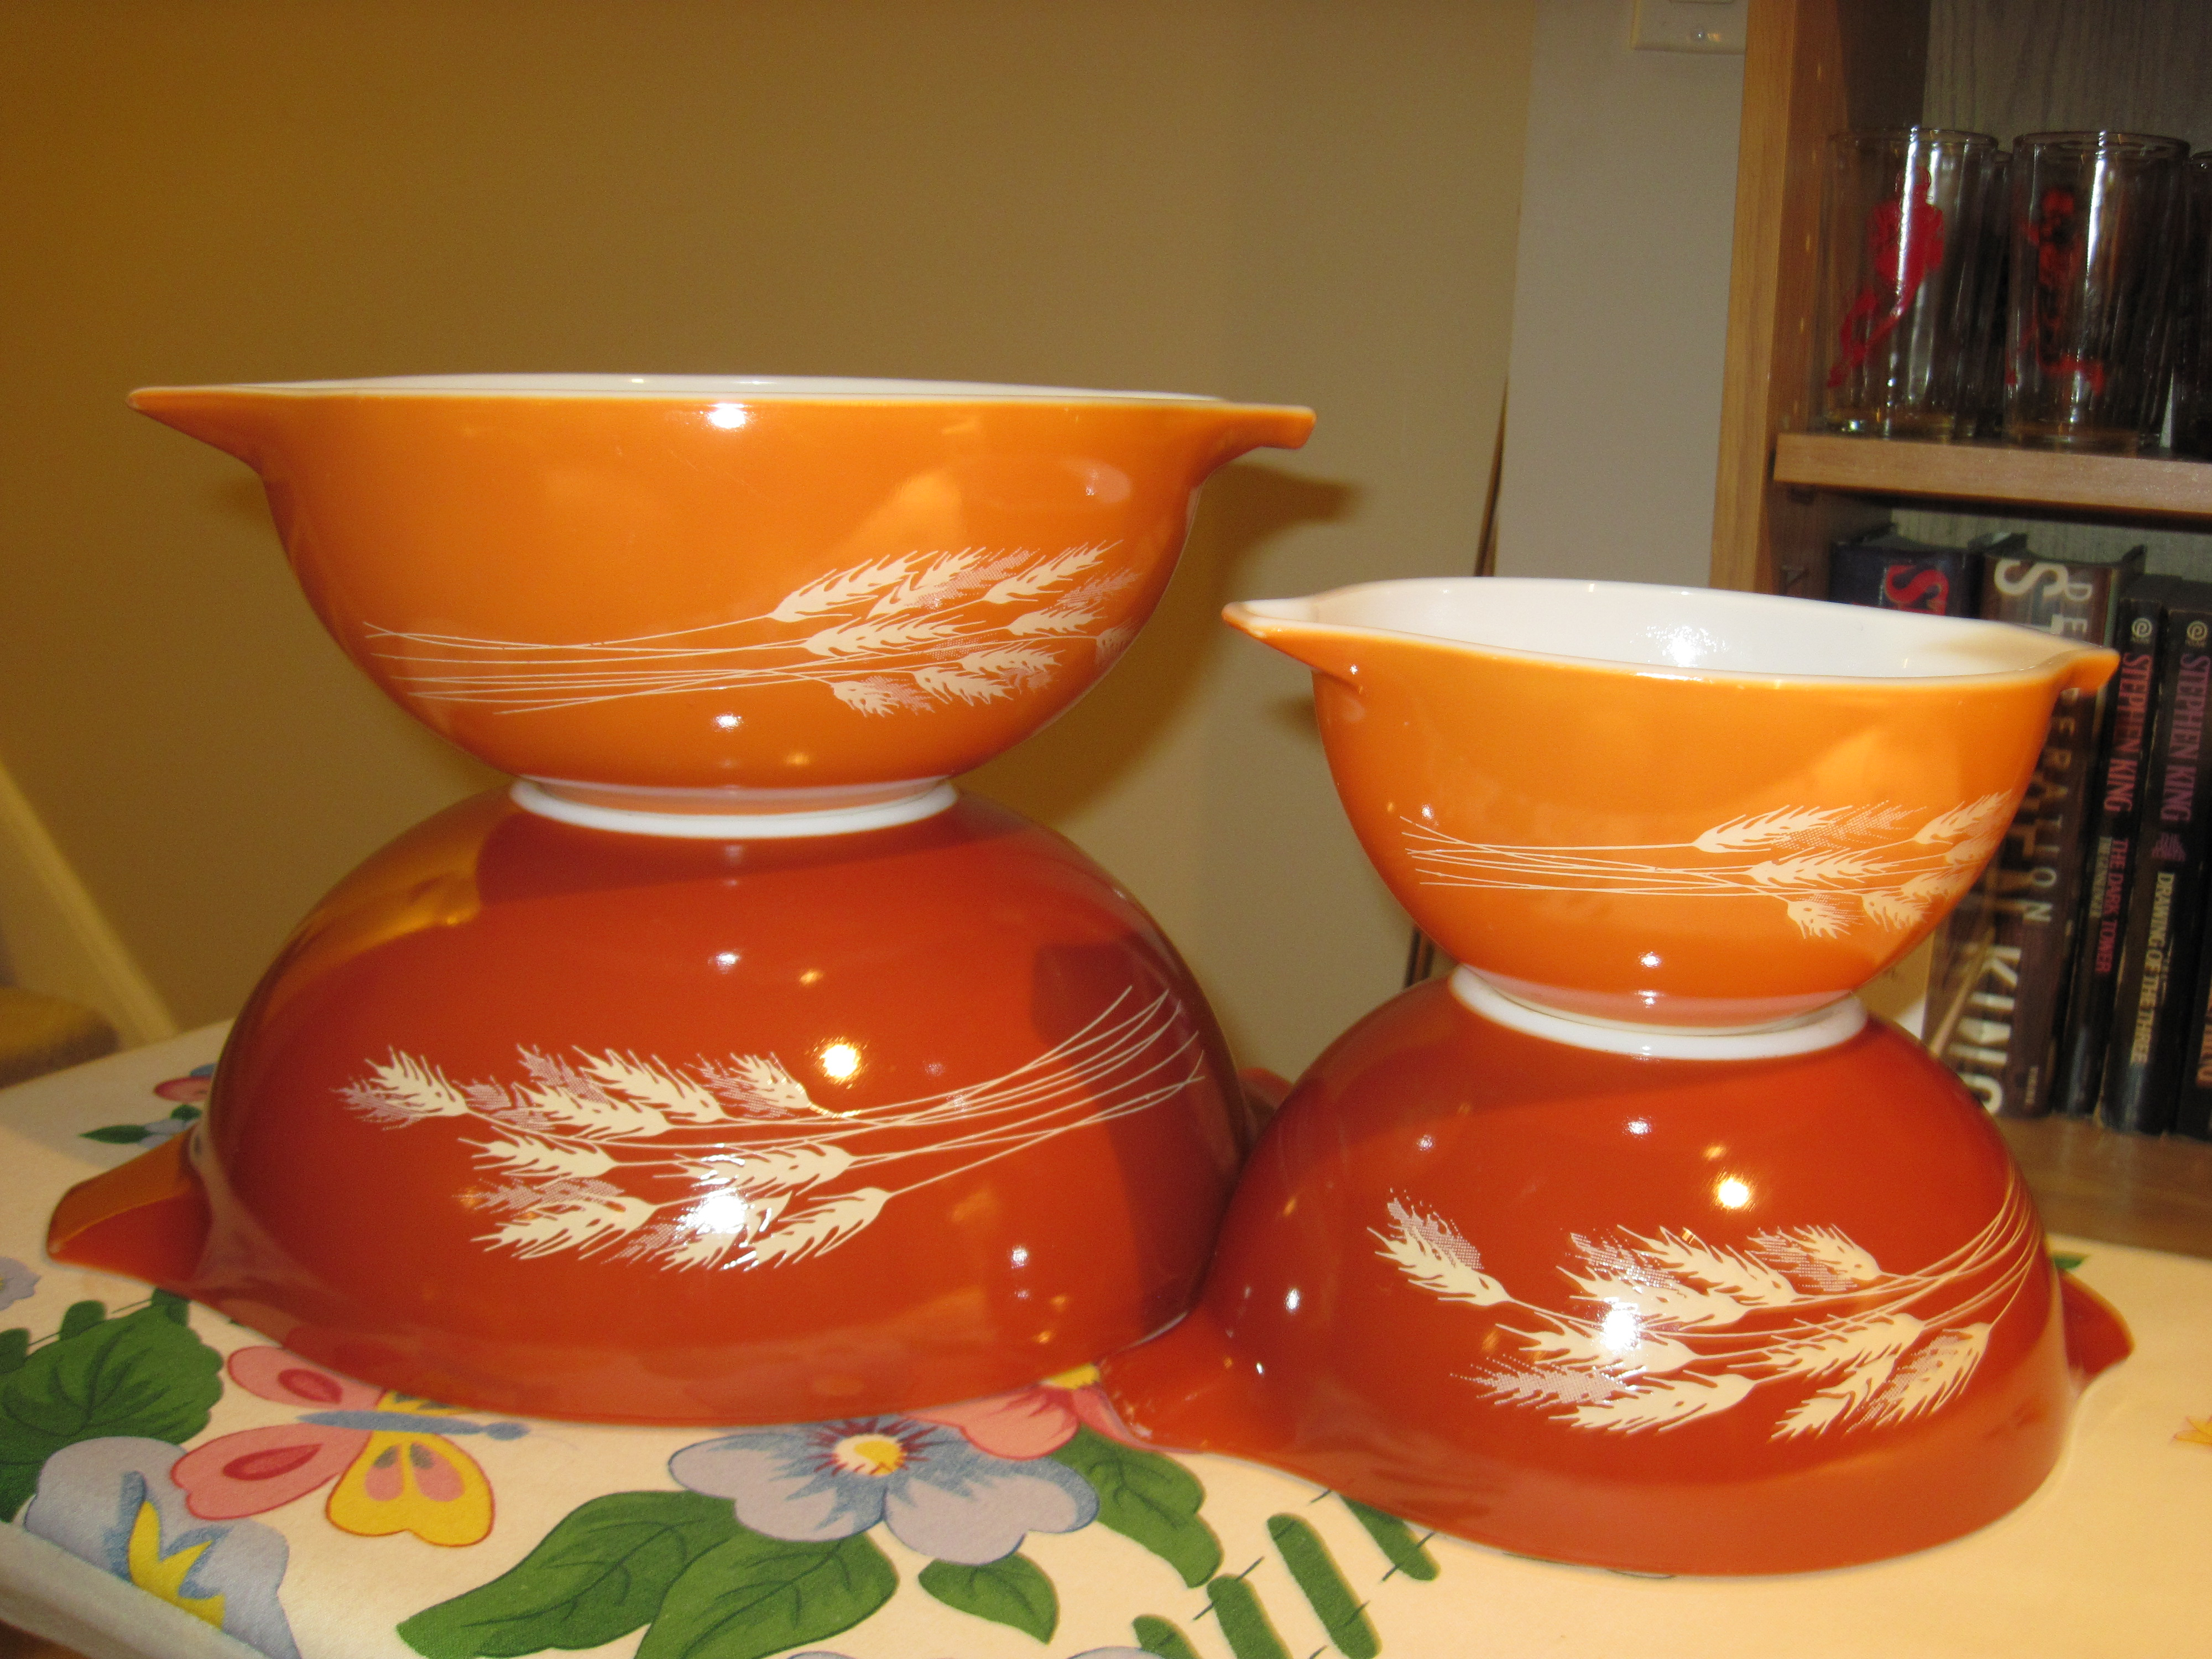 Pyrex Autumn Harvest Cinderella Mixing Bowls | fabfindsblog